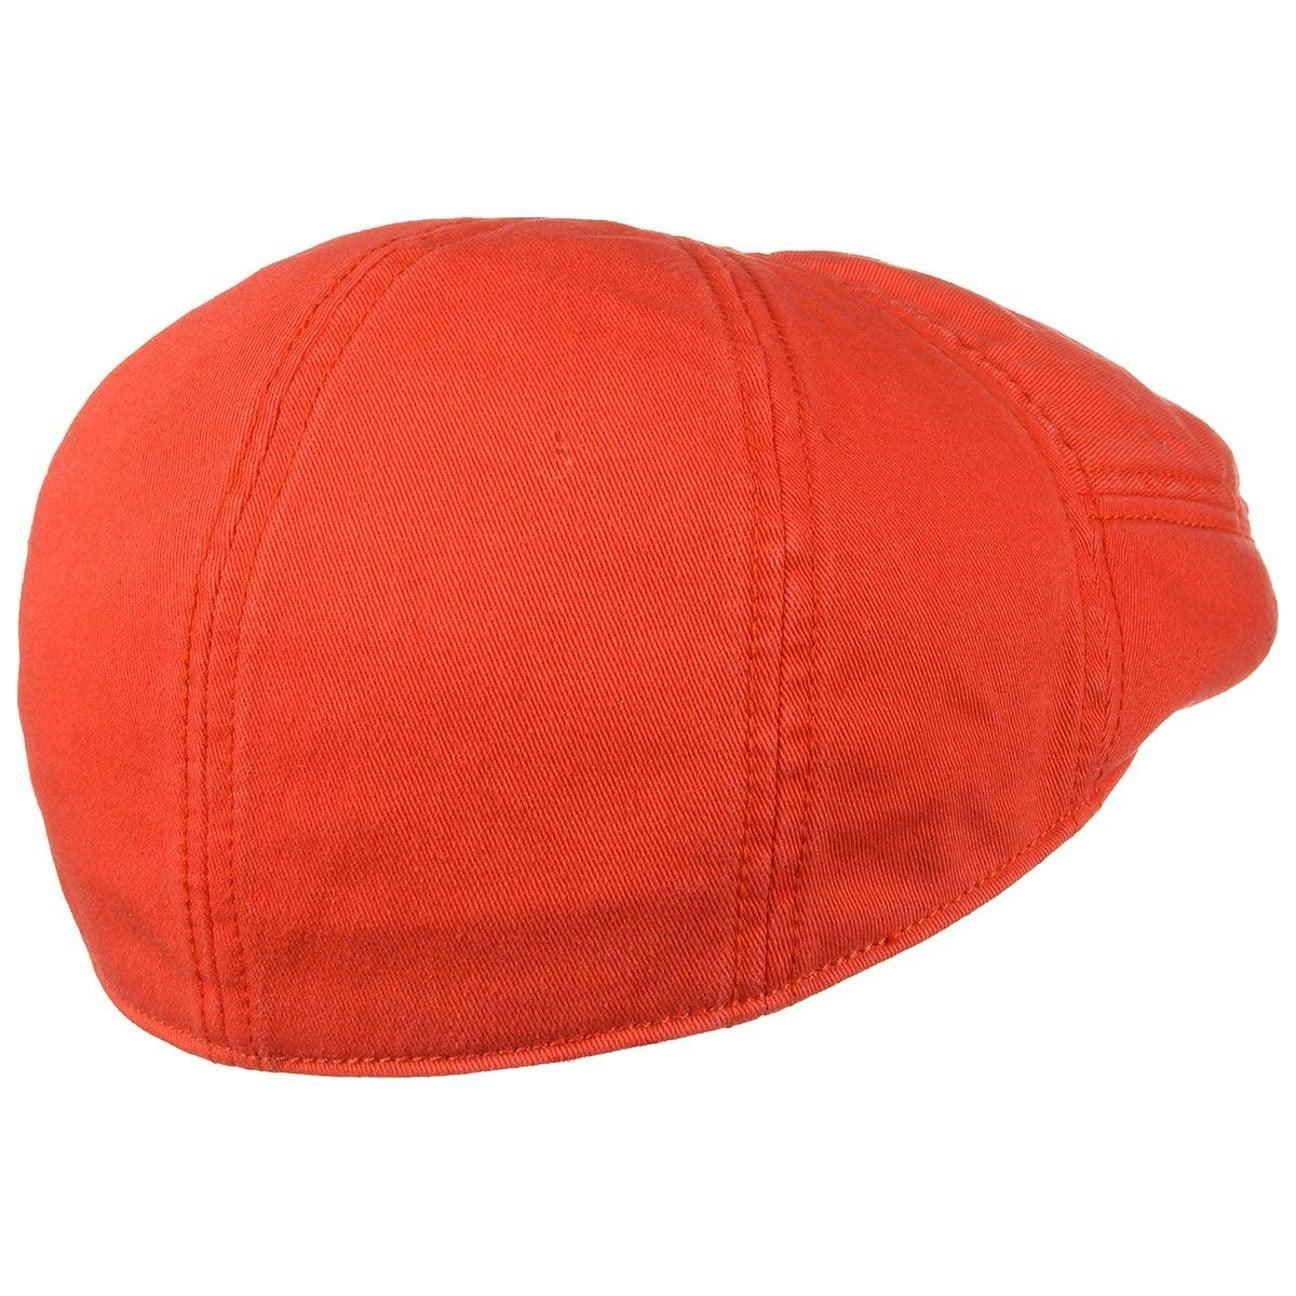 ... Paradise Cotton Flat Cap by Stetson - orange 4 ... 85857902bf68